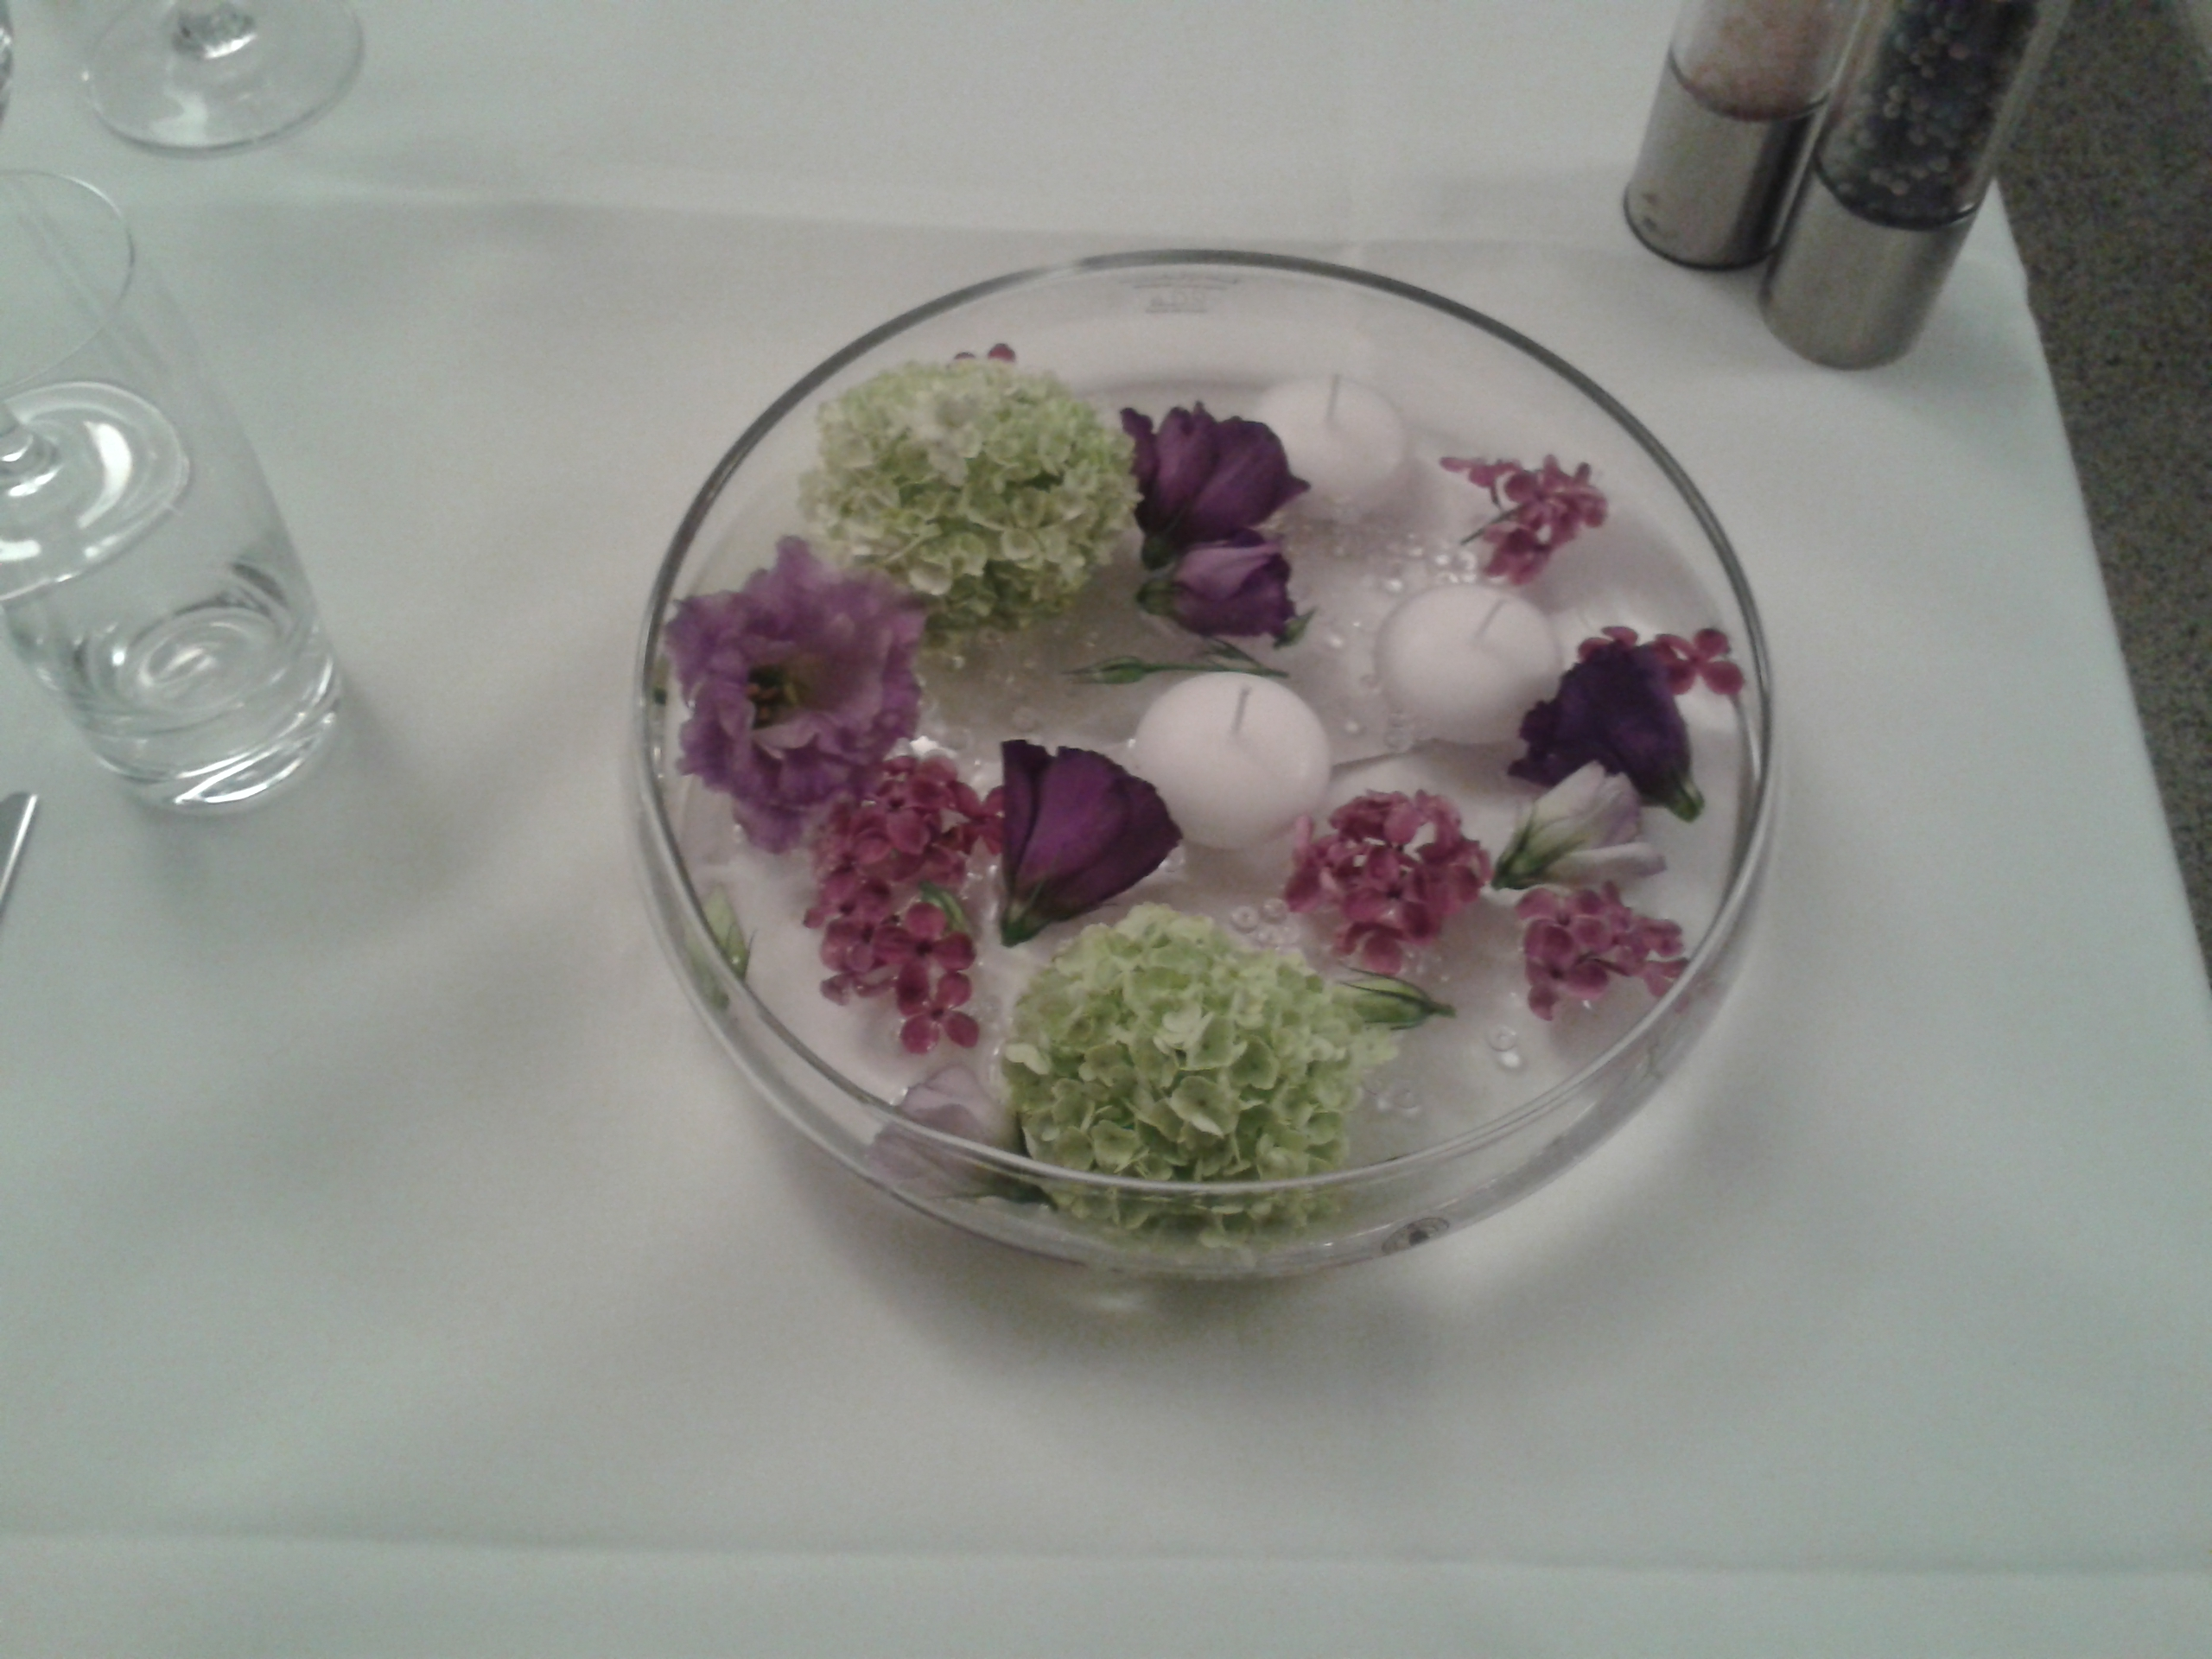 Tischdekoration | Blumen & Kerzen